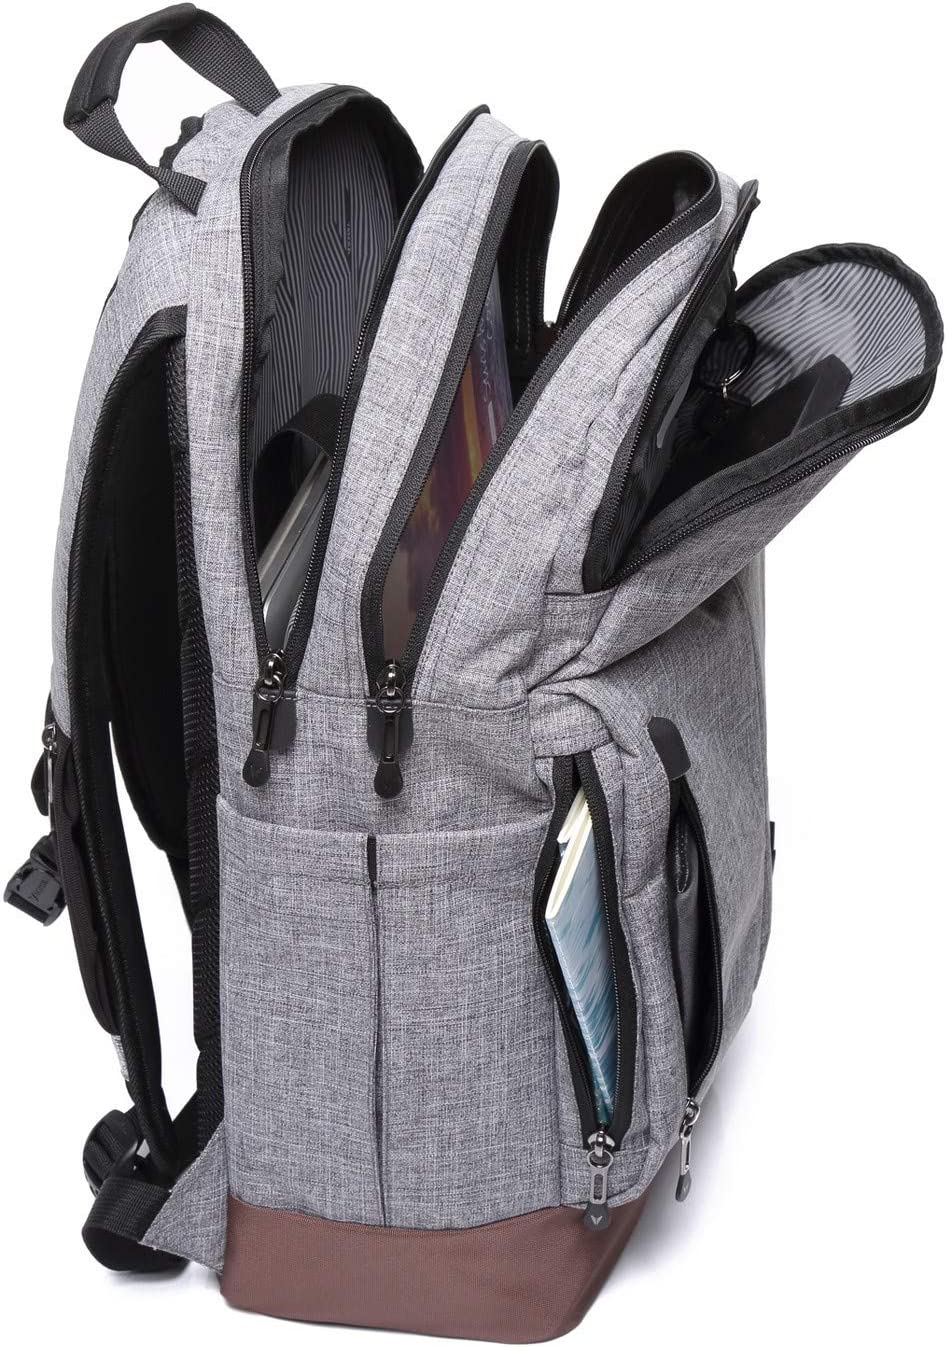 Bondka EOLUS backpack Sport College School Travel Backpack